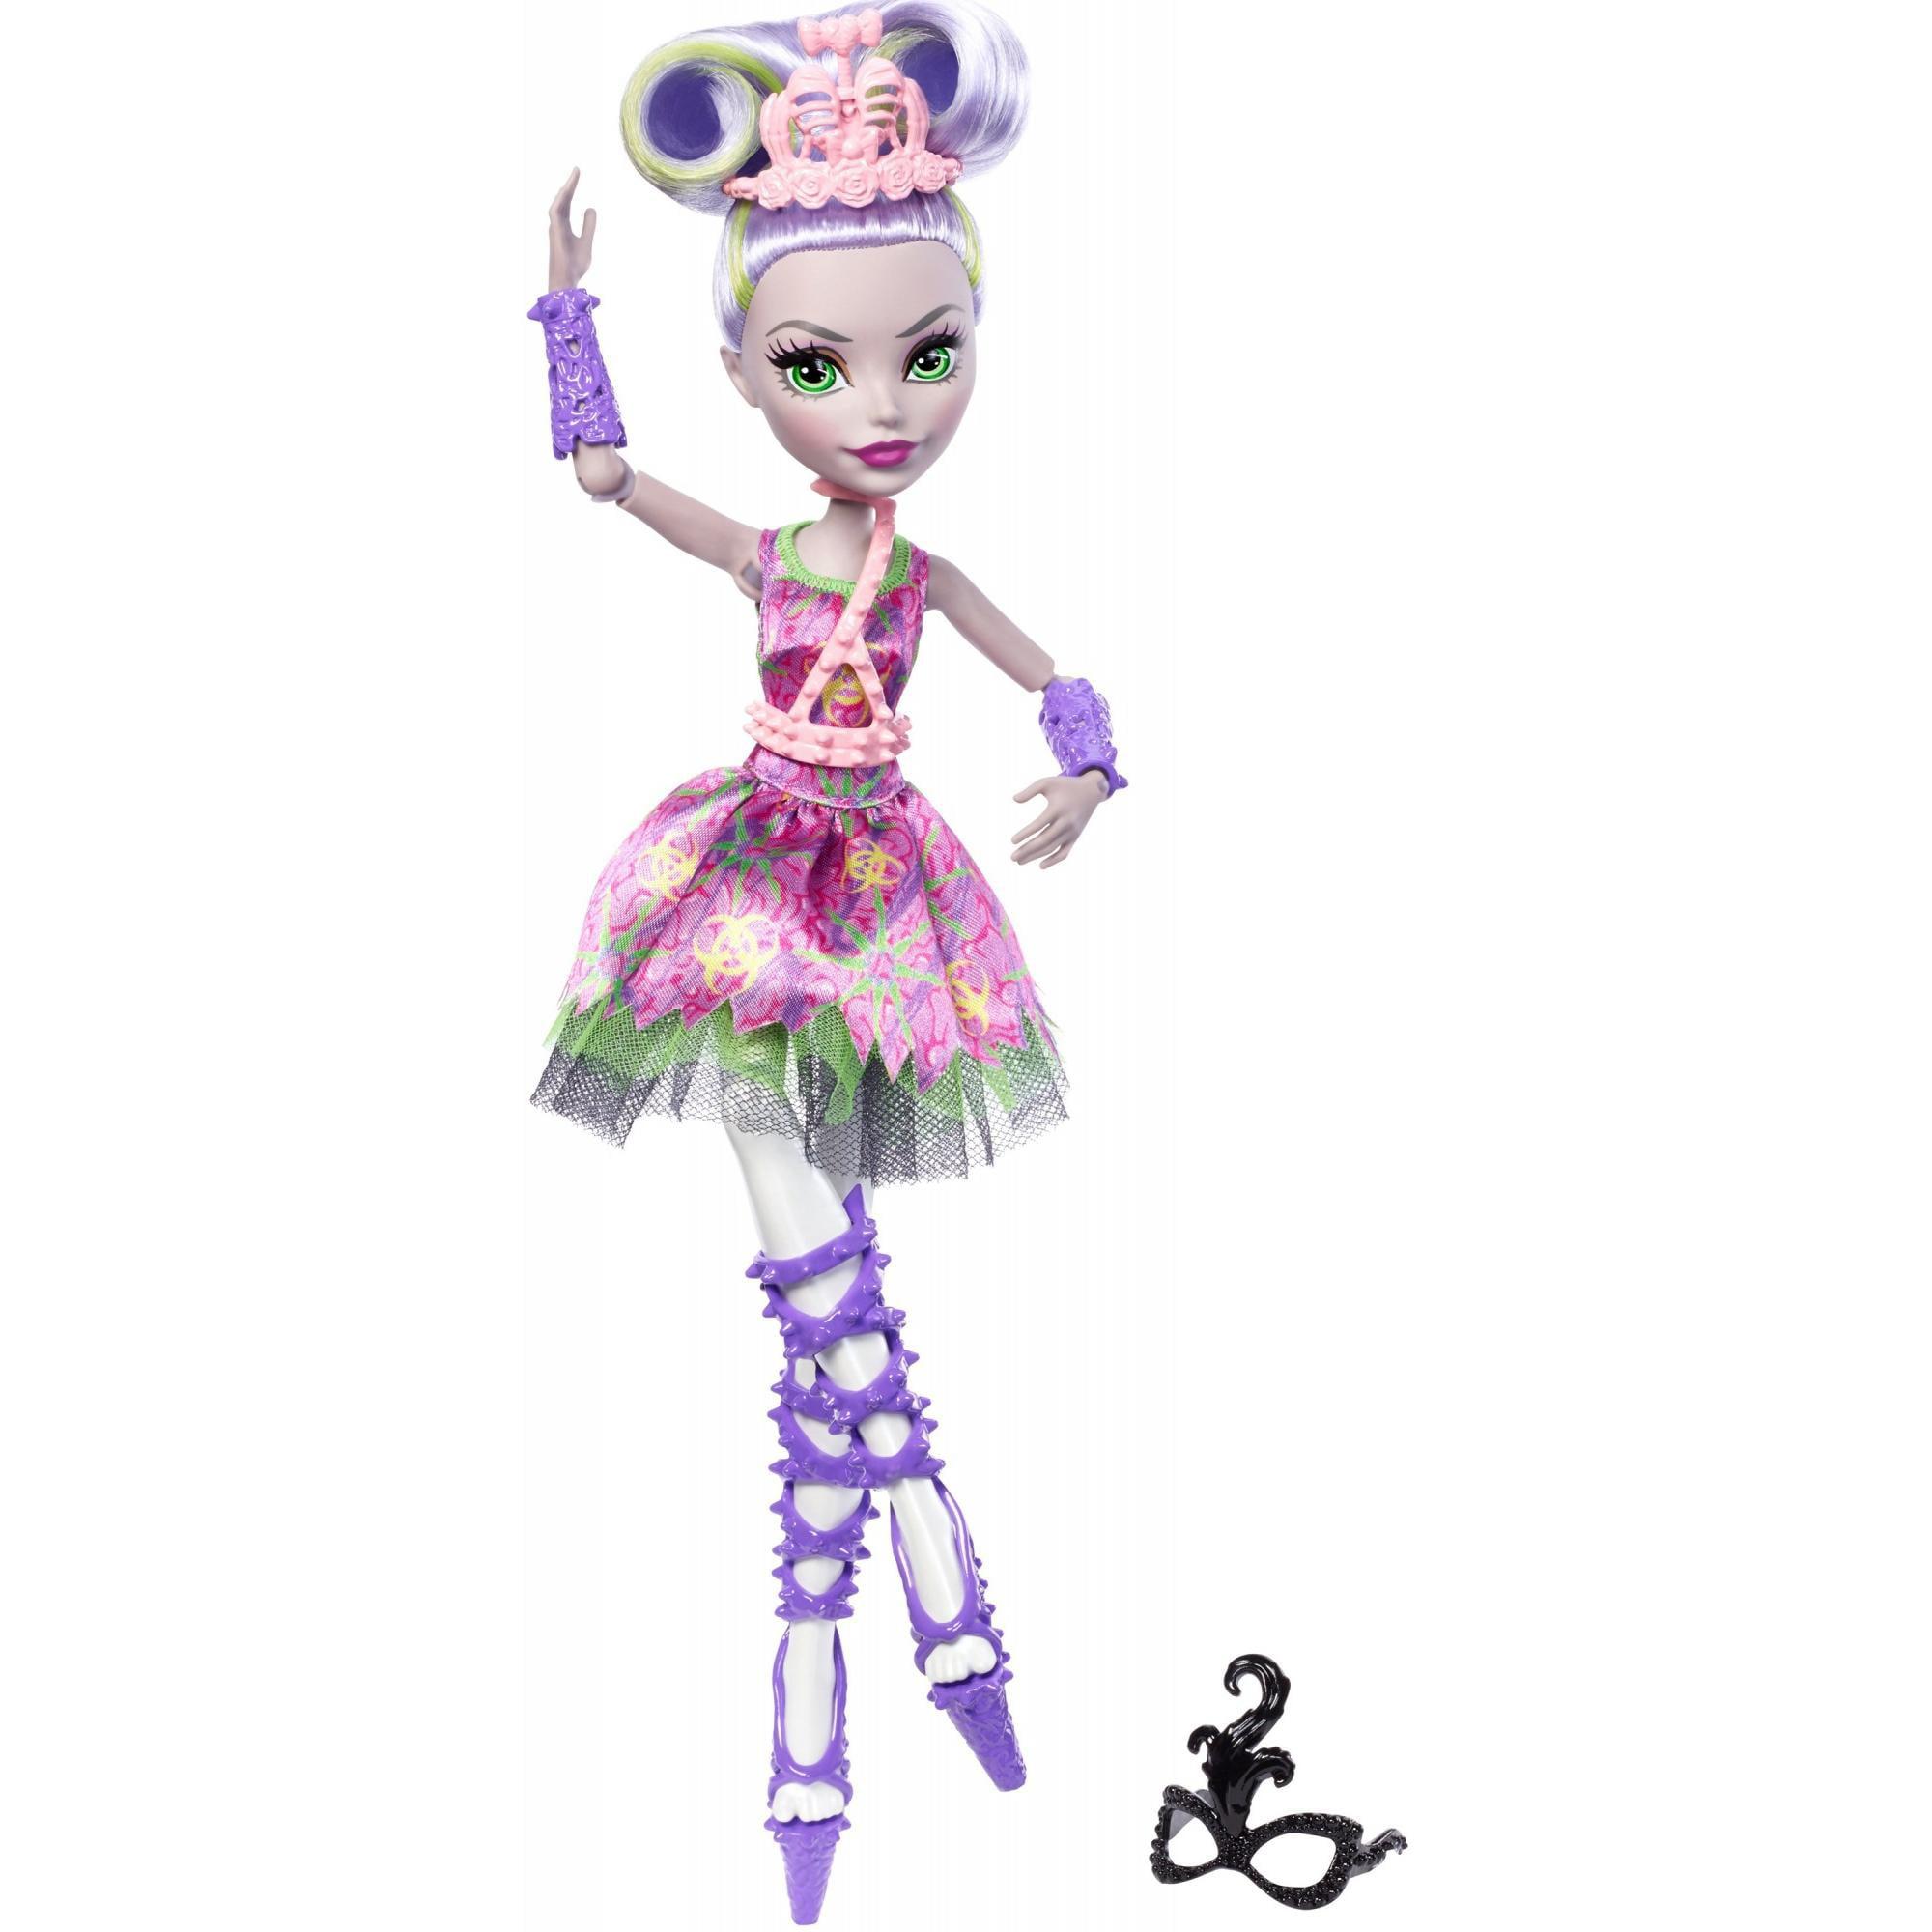 Monster High Ballerina Ghouls Moanica D'kay Doll